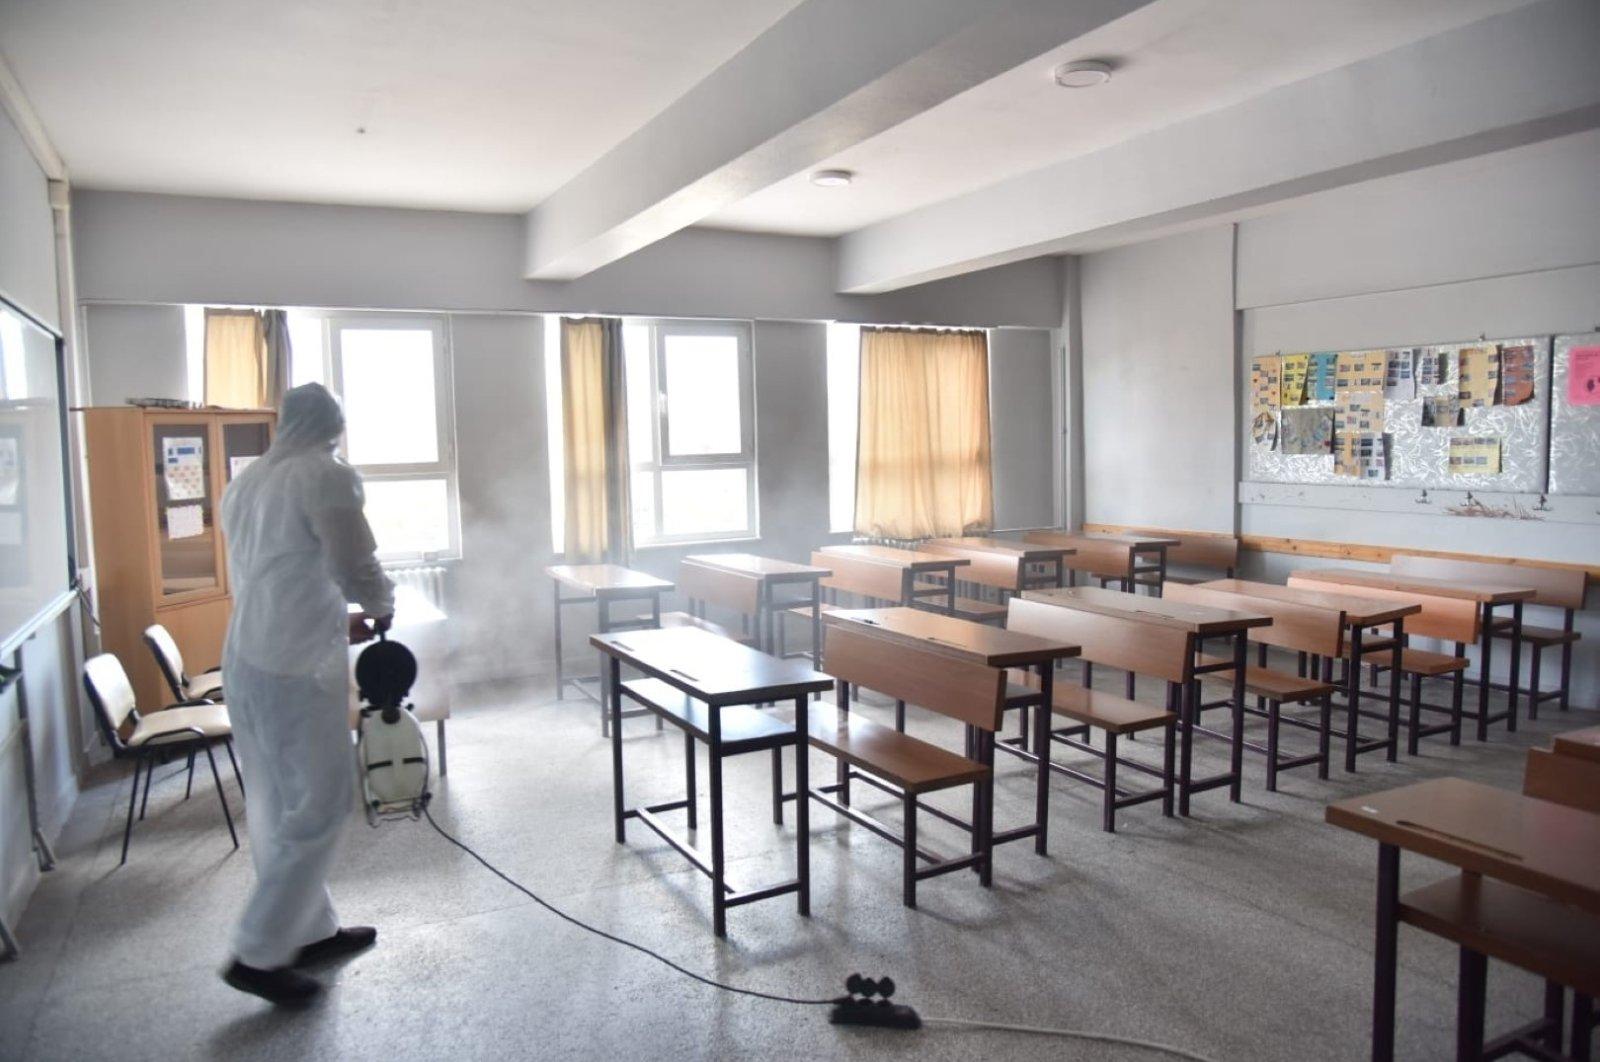 A worker disinfects a classroom at a school in Kartepe district, Kocaeli, northwestern Turkey, Aug. 23, 2021. (IHA PHOTO)